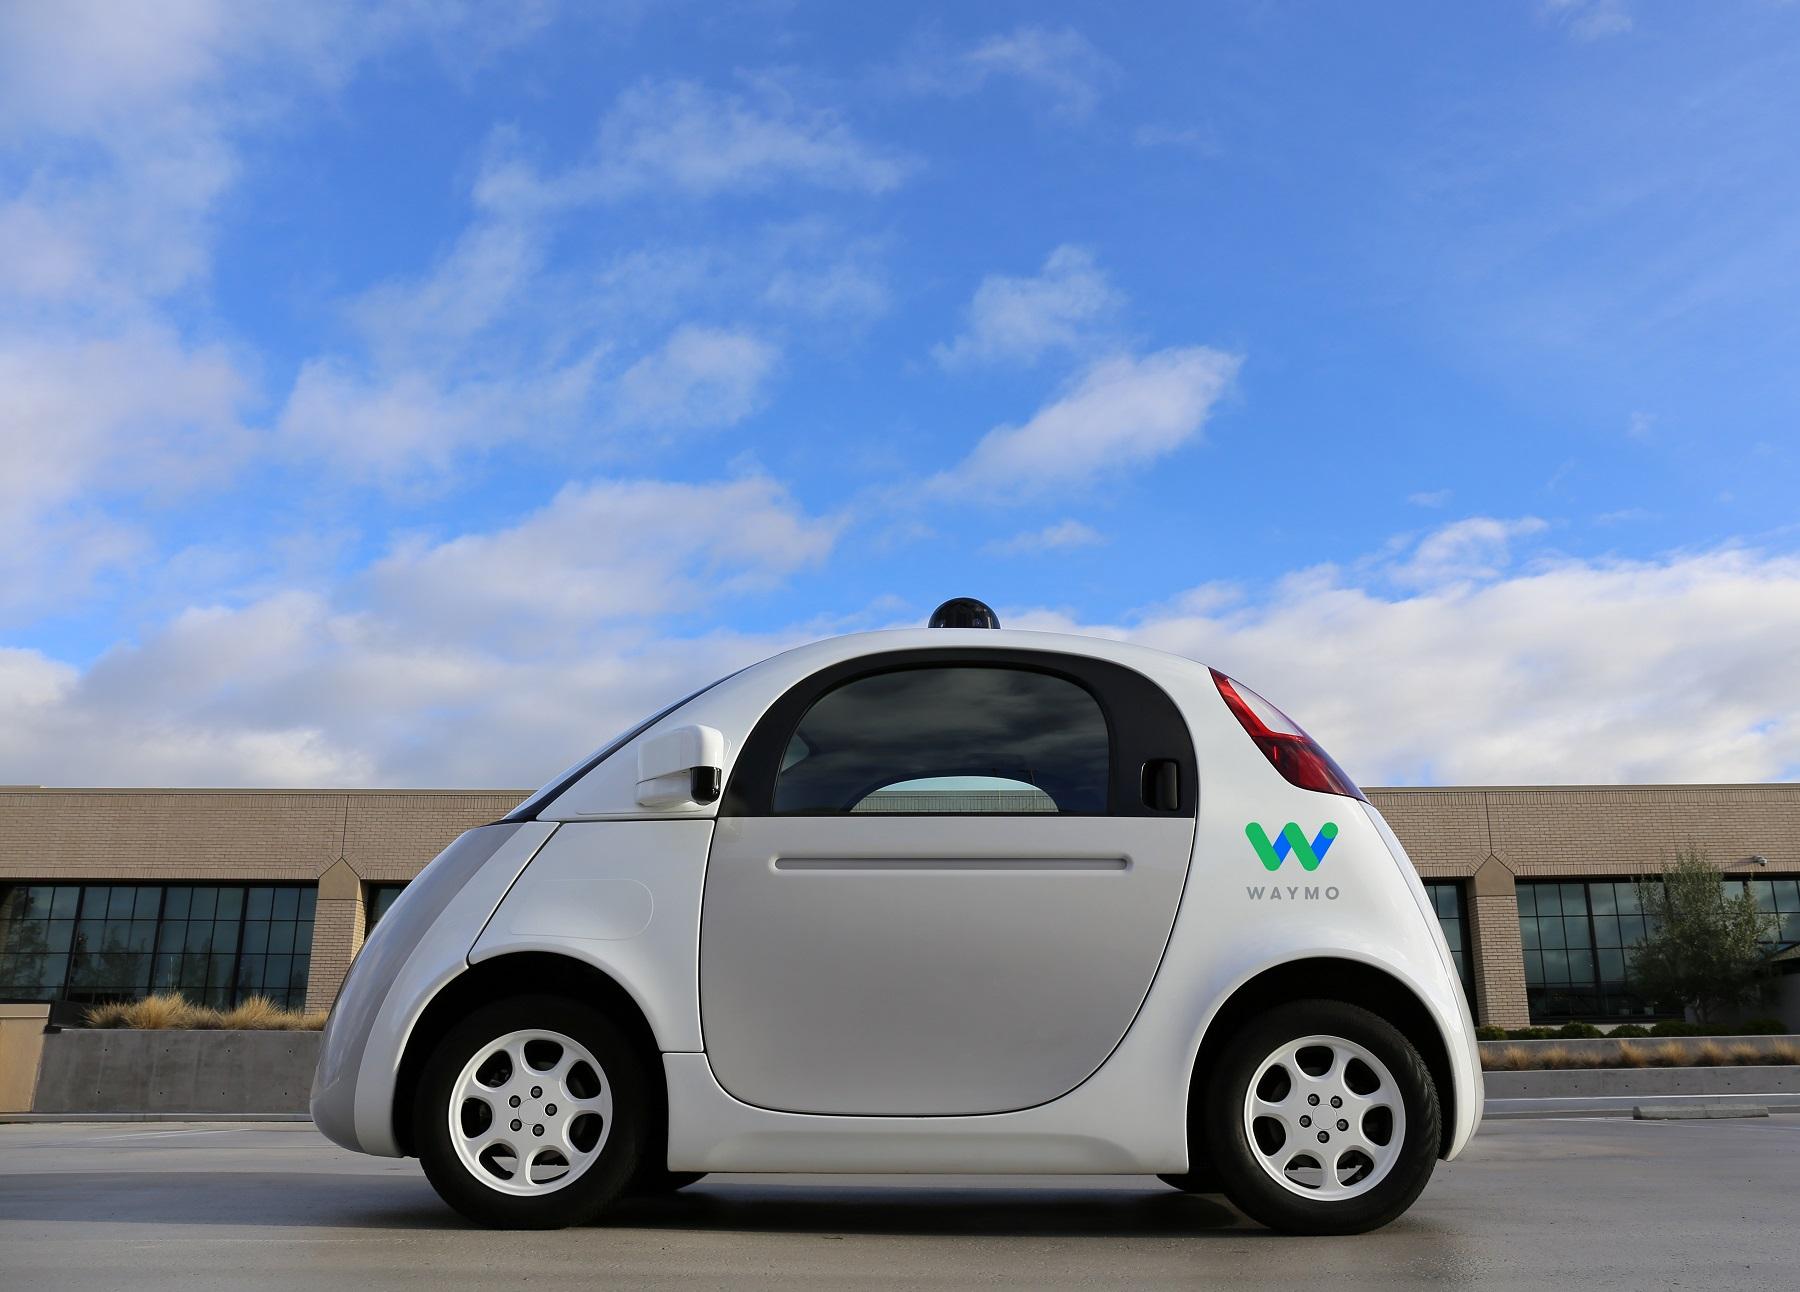 Waymo Firefly 1 self-driving car